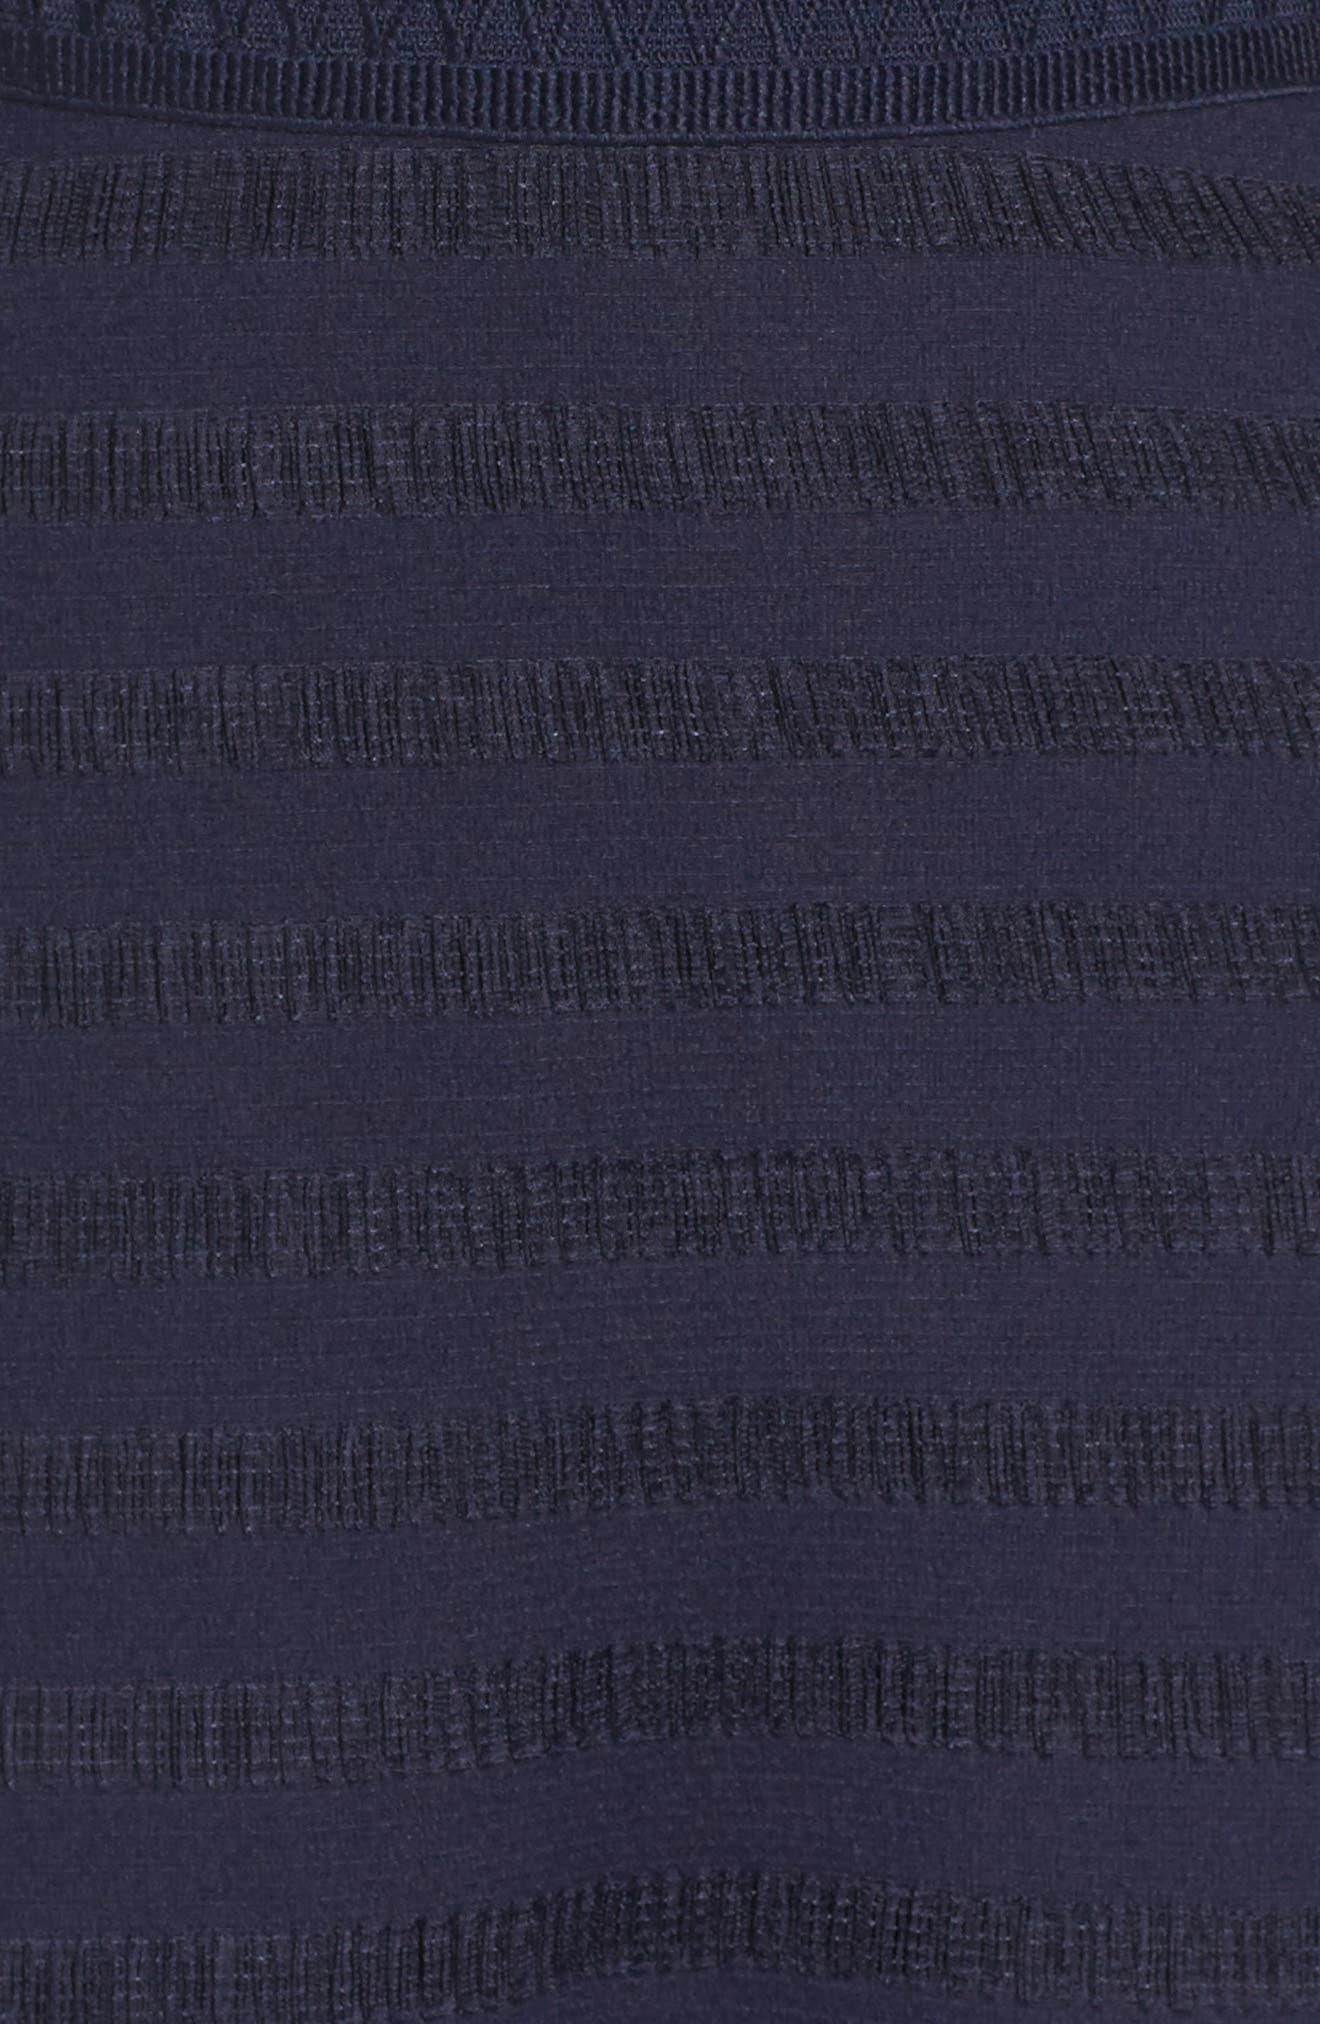 Elsie Ruffle Sleeve Fit & Flare Dress,                             Alternate thumbnail 5, color,                             414